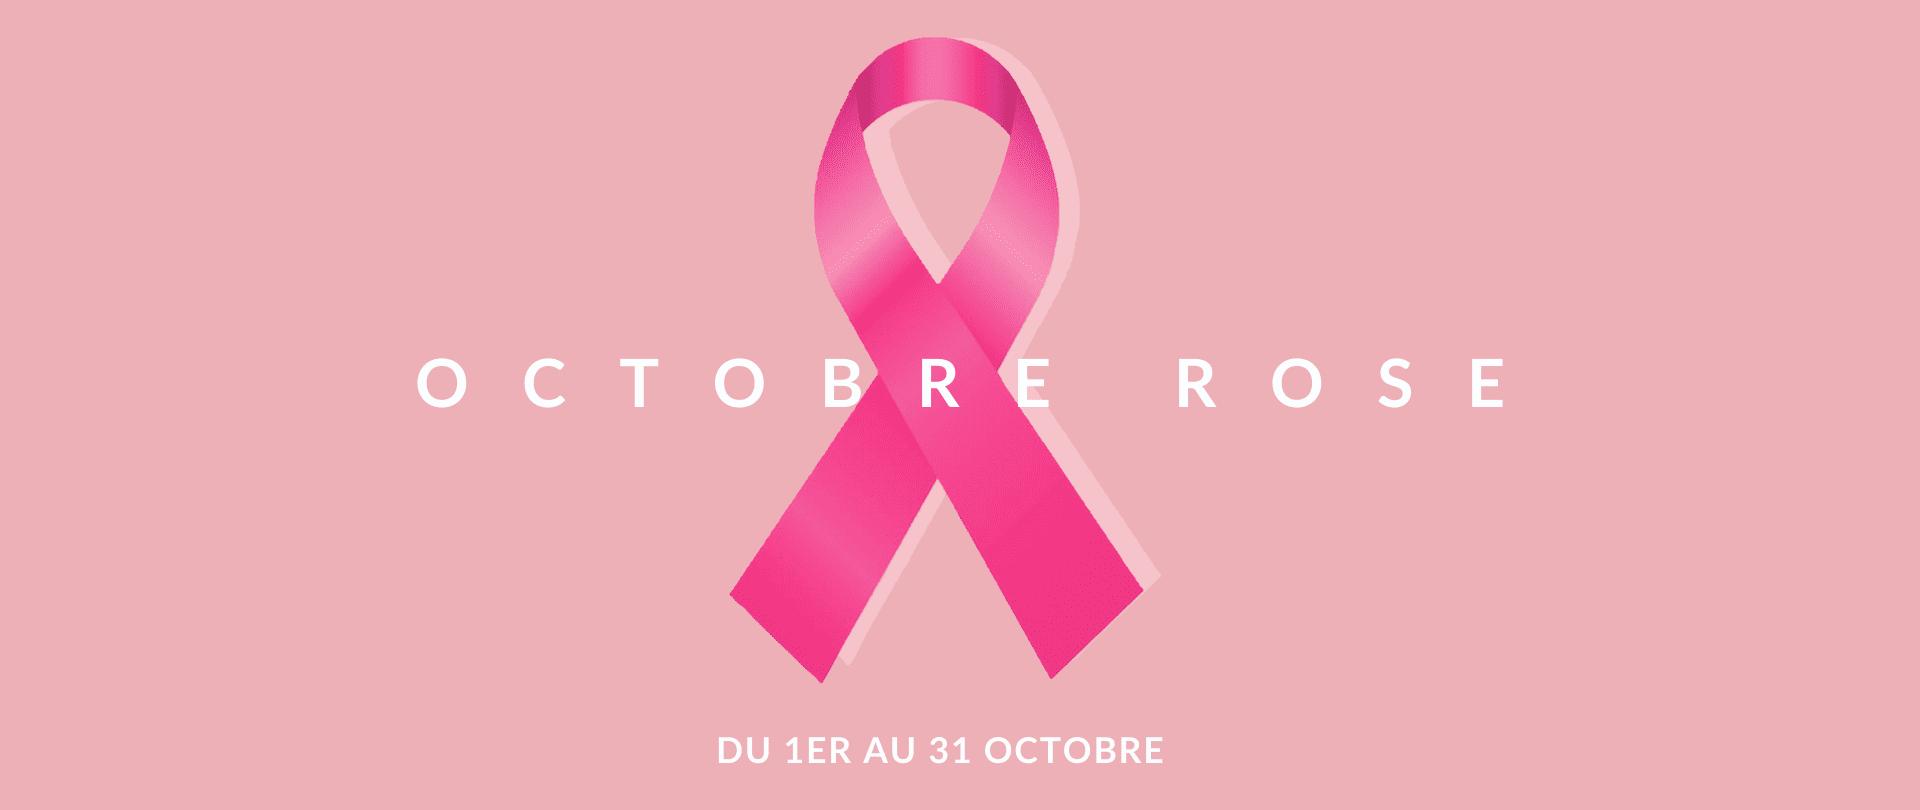 Banniere-octobre-rose